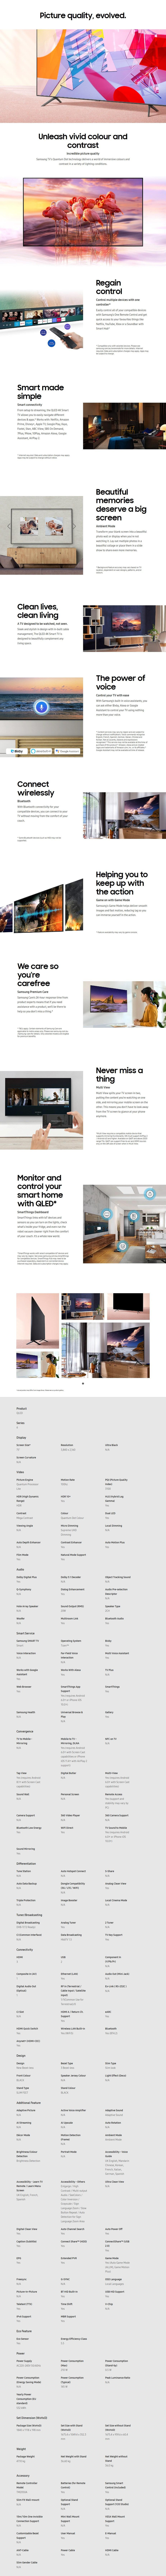 "Samsung Series 60 QA75Q60TAW 75"" 100Hz 4K UHD QLED TV - 2020 Model - Overview 1"